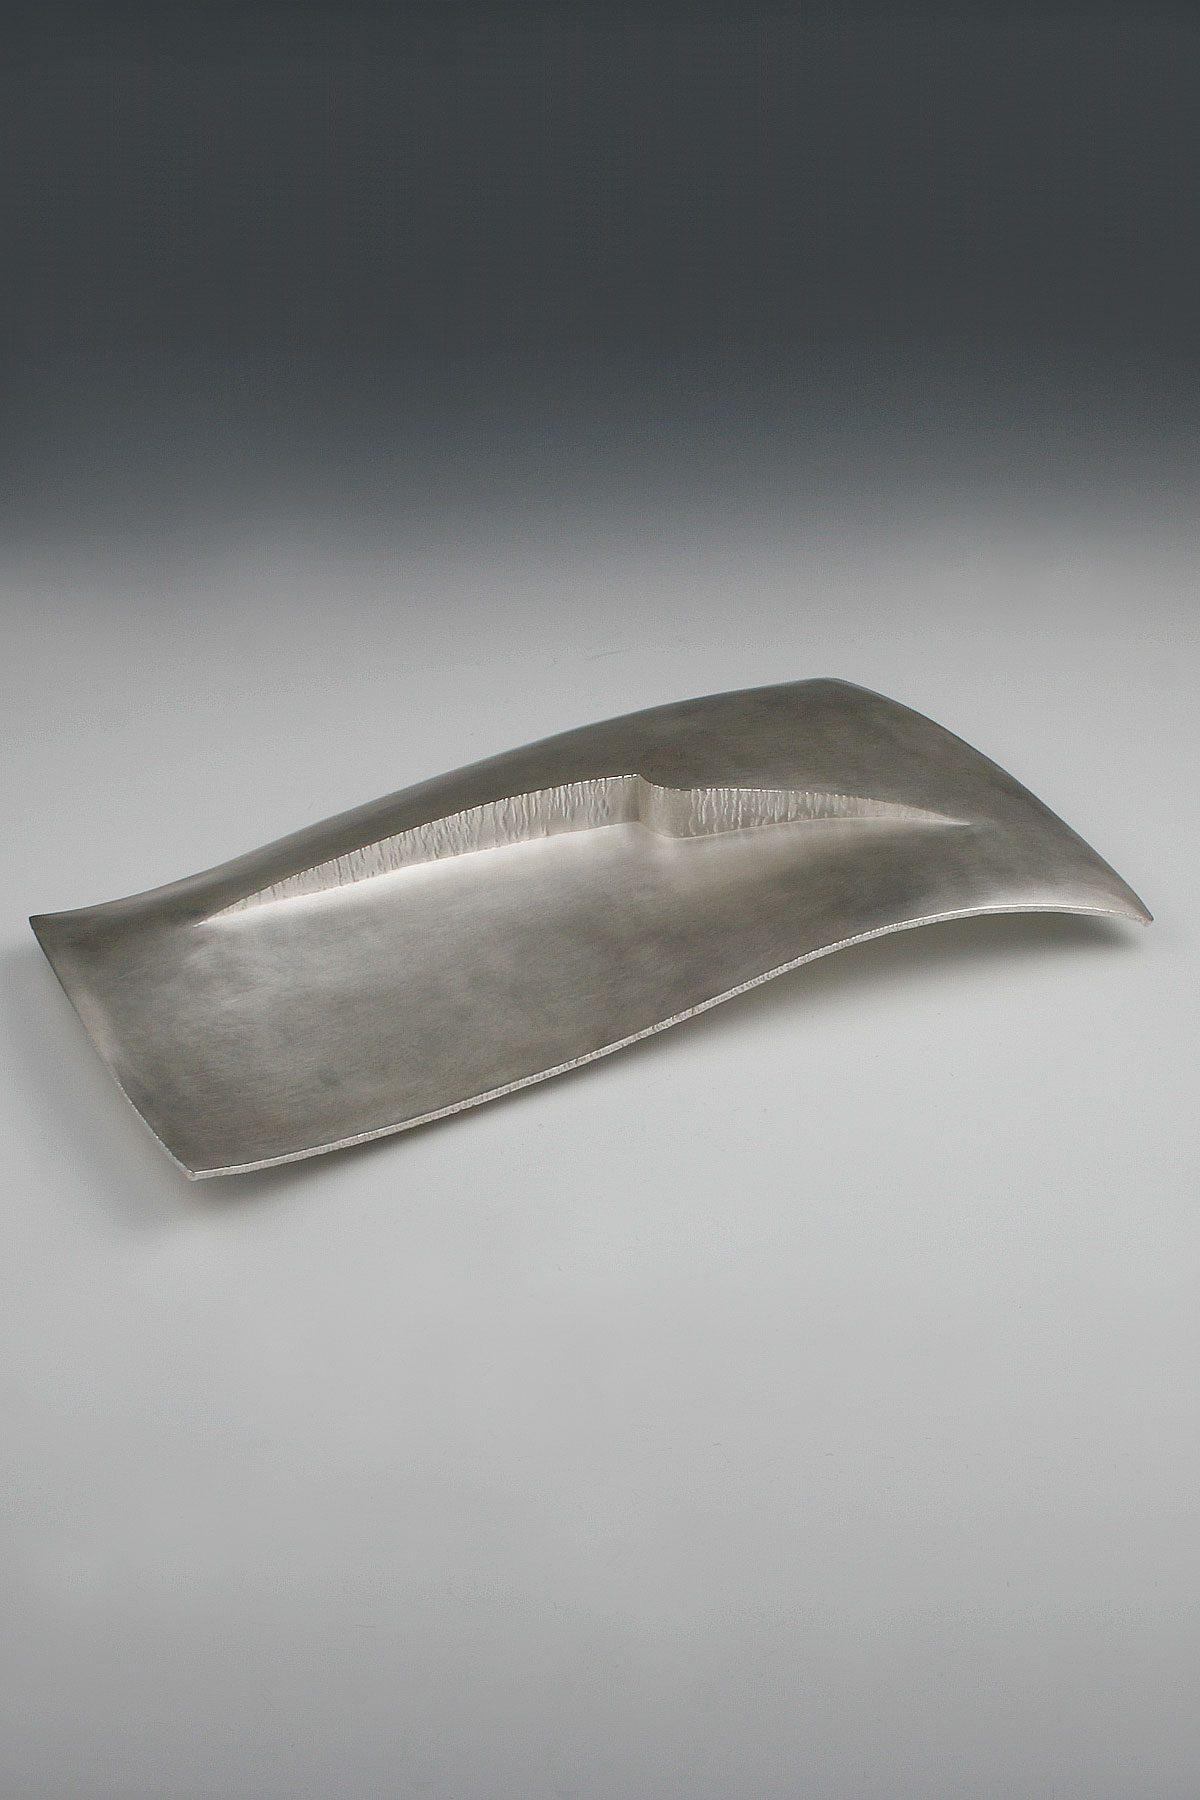 Moderne Silber Schale Sterling-Silber silber services modernes Silber tafelsilber modern